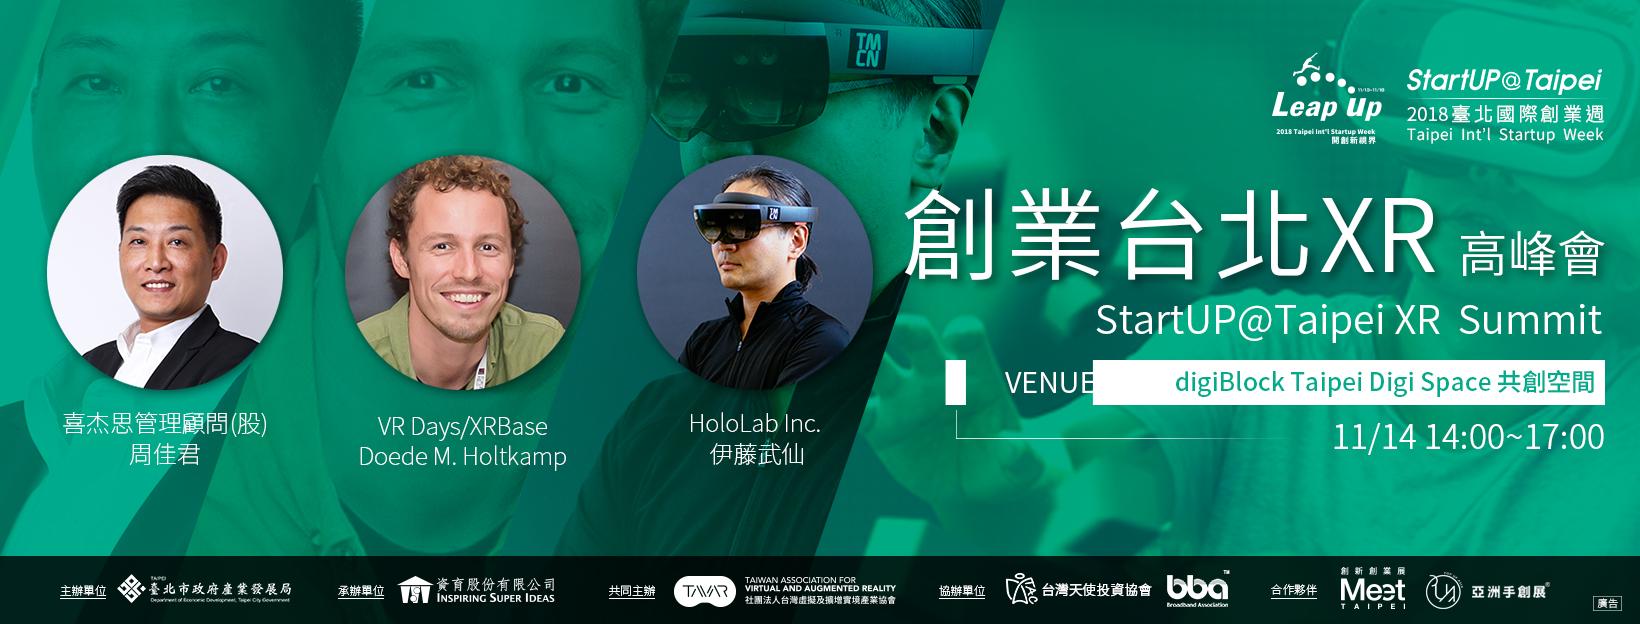 2018 Taipei Int'l Startup Week 11/14 StartUP@Taipei XR SummitImage